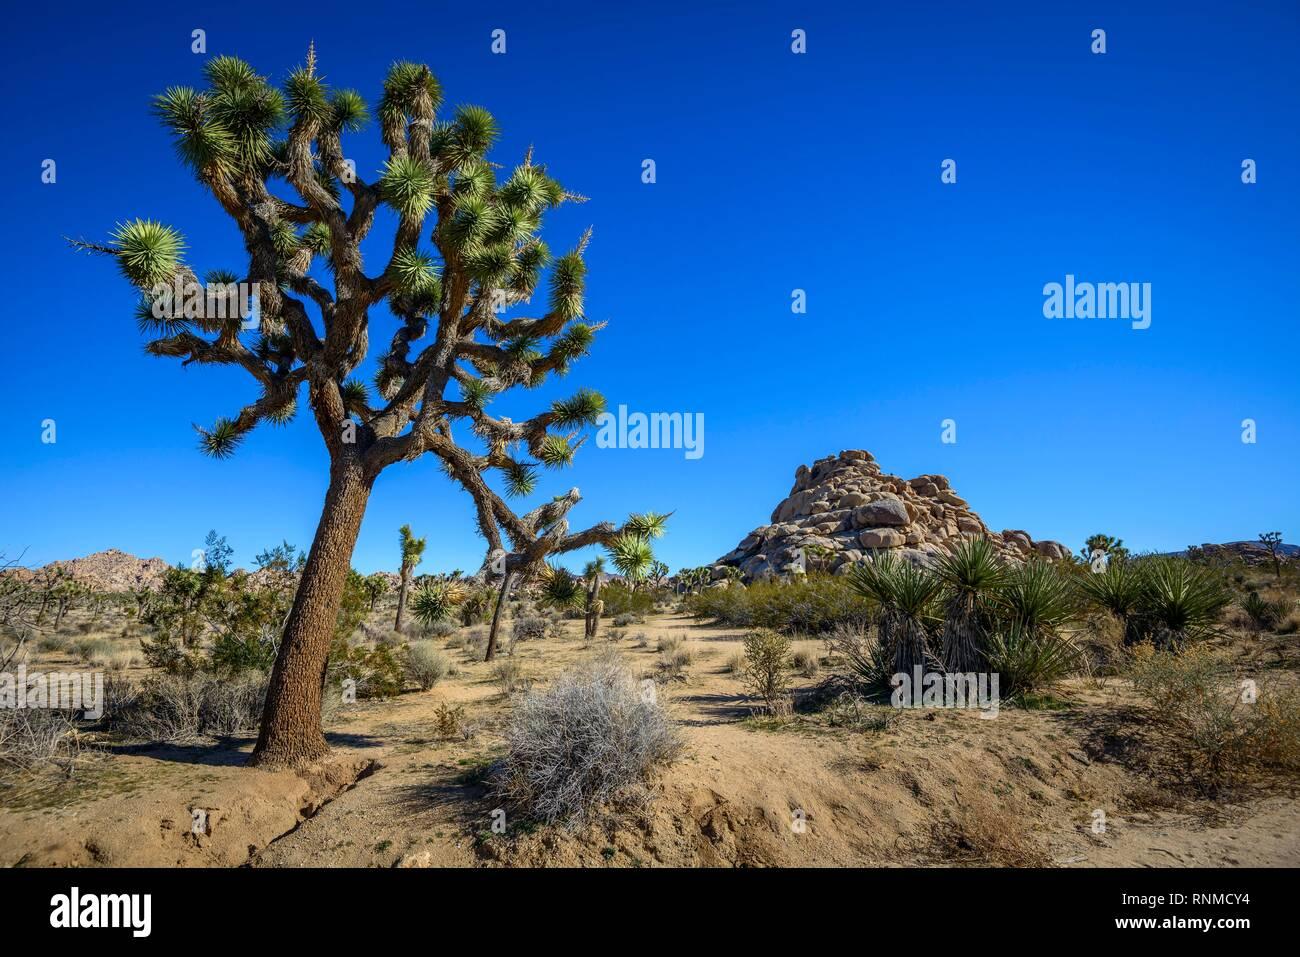 Joshua Trees (Yucca brevifolia), Boy Scout Trail, Joshua Tree National Park, Desert Center, California, USA - Stock Image